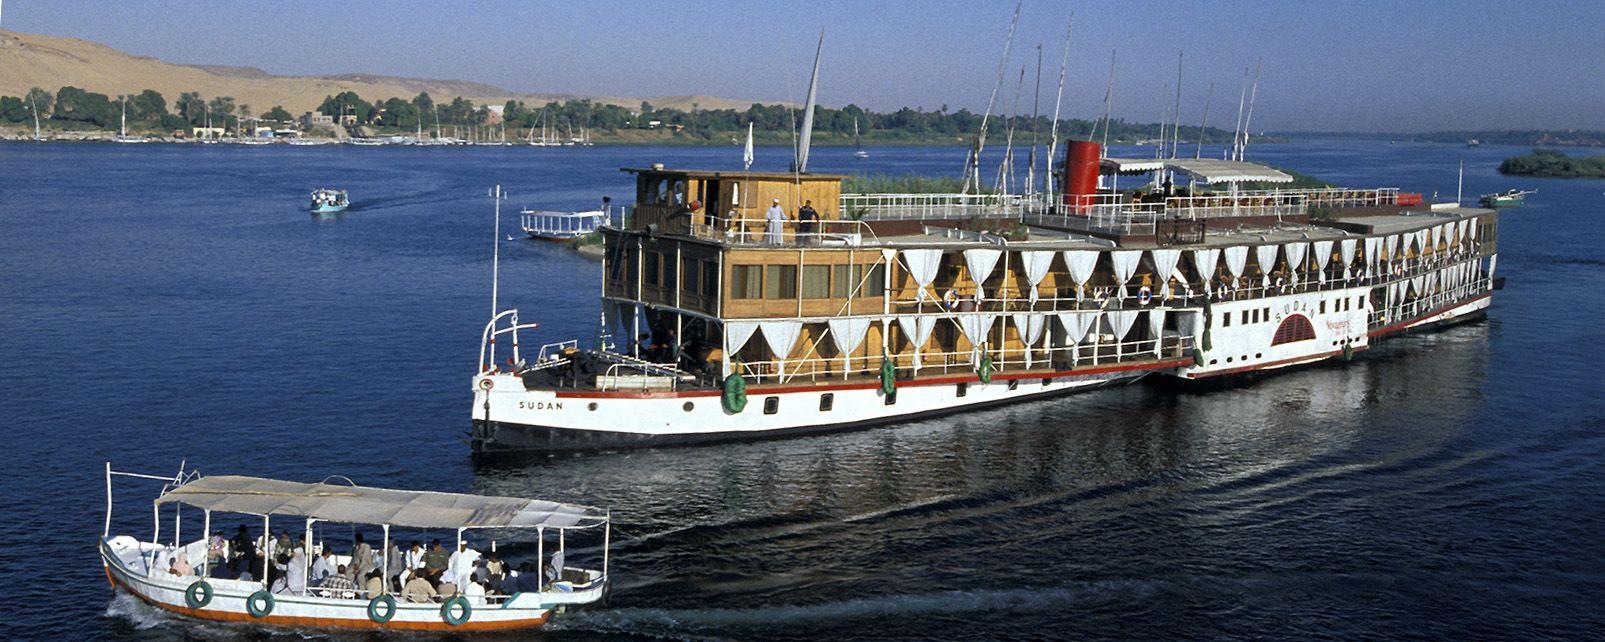 Hotel Bateau Steam Ship Sudan